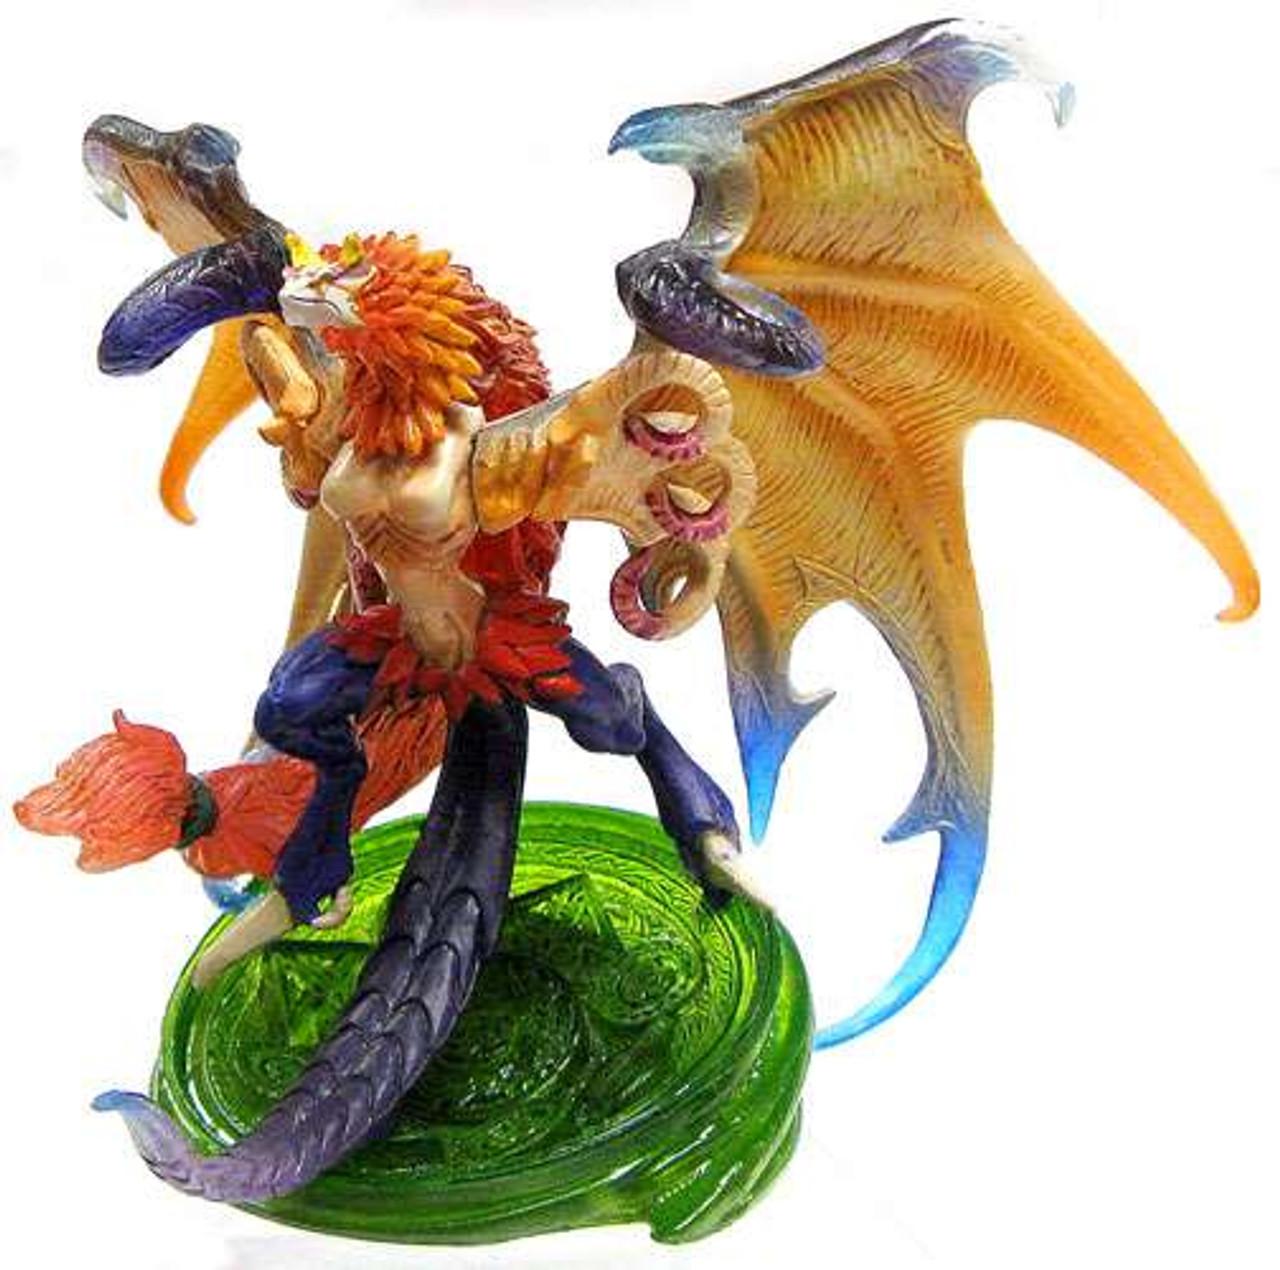 SQUARE Final Fantasy Creatures Kai vol.2 Ifrit loose